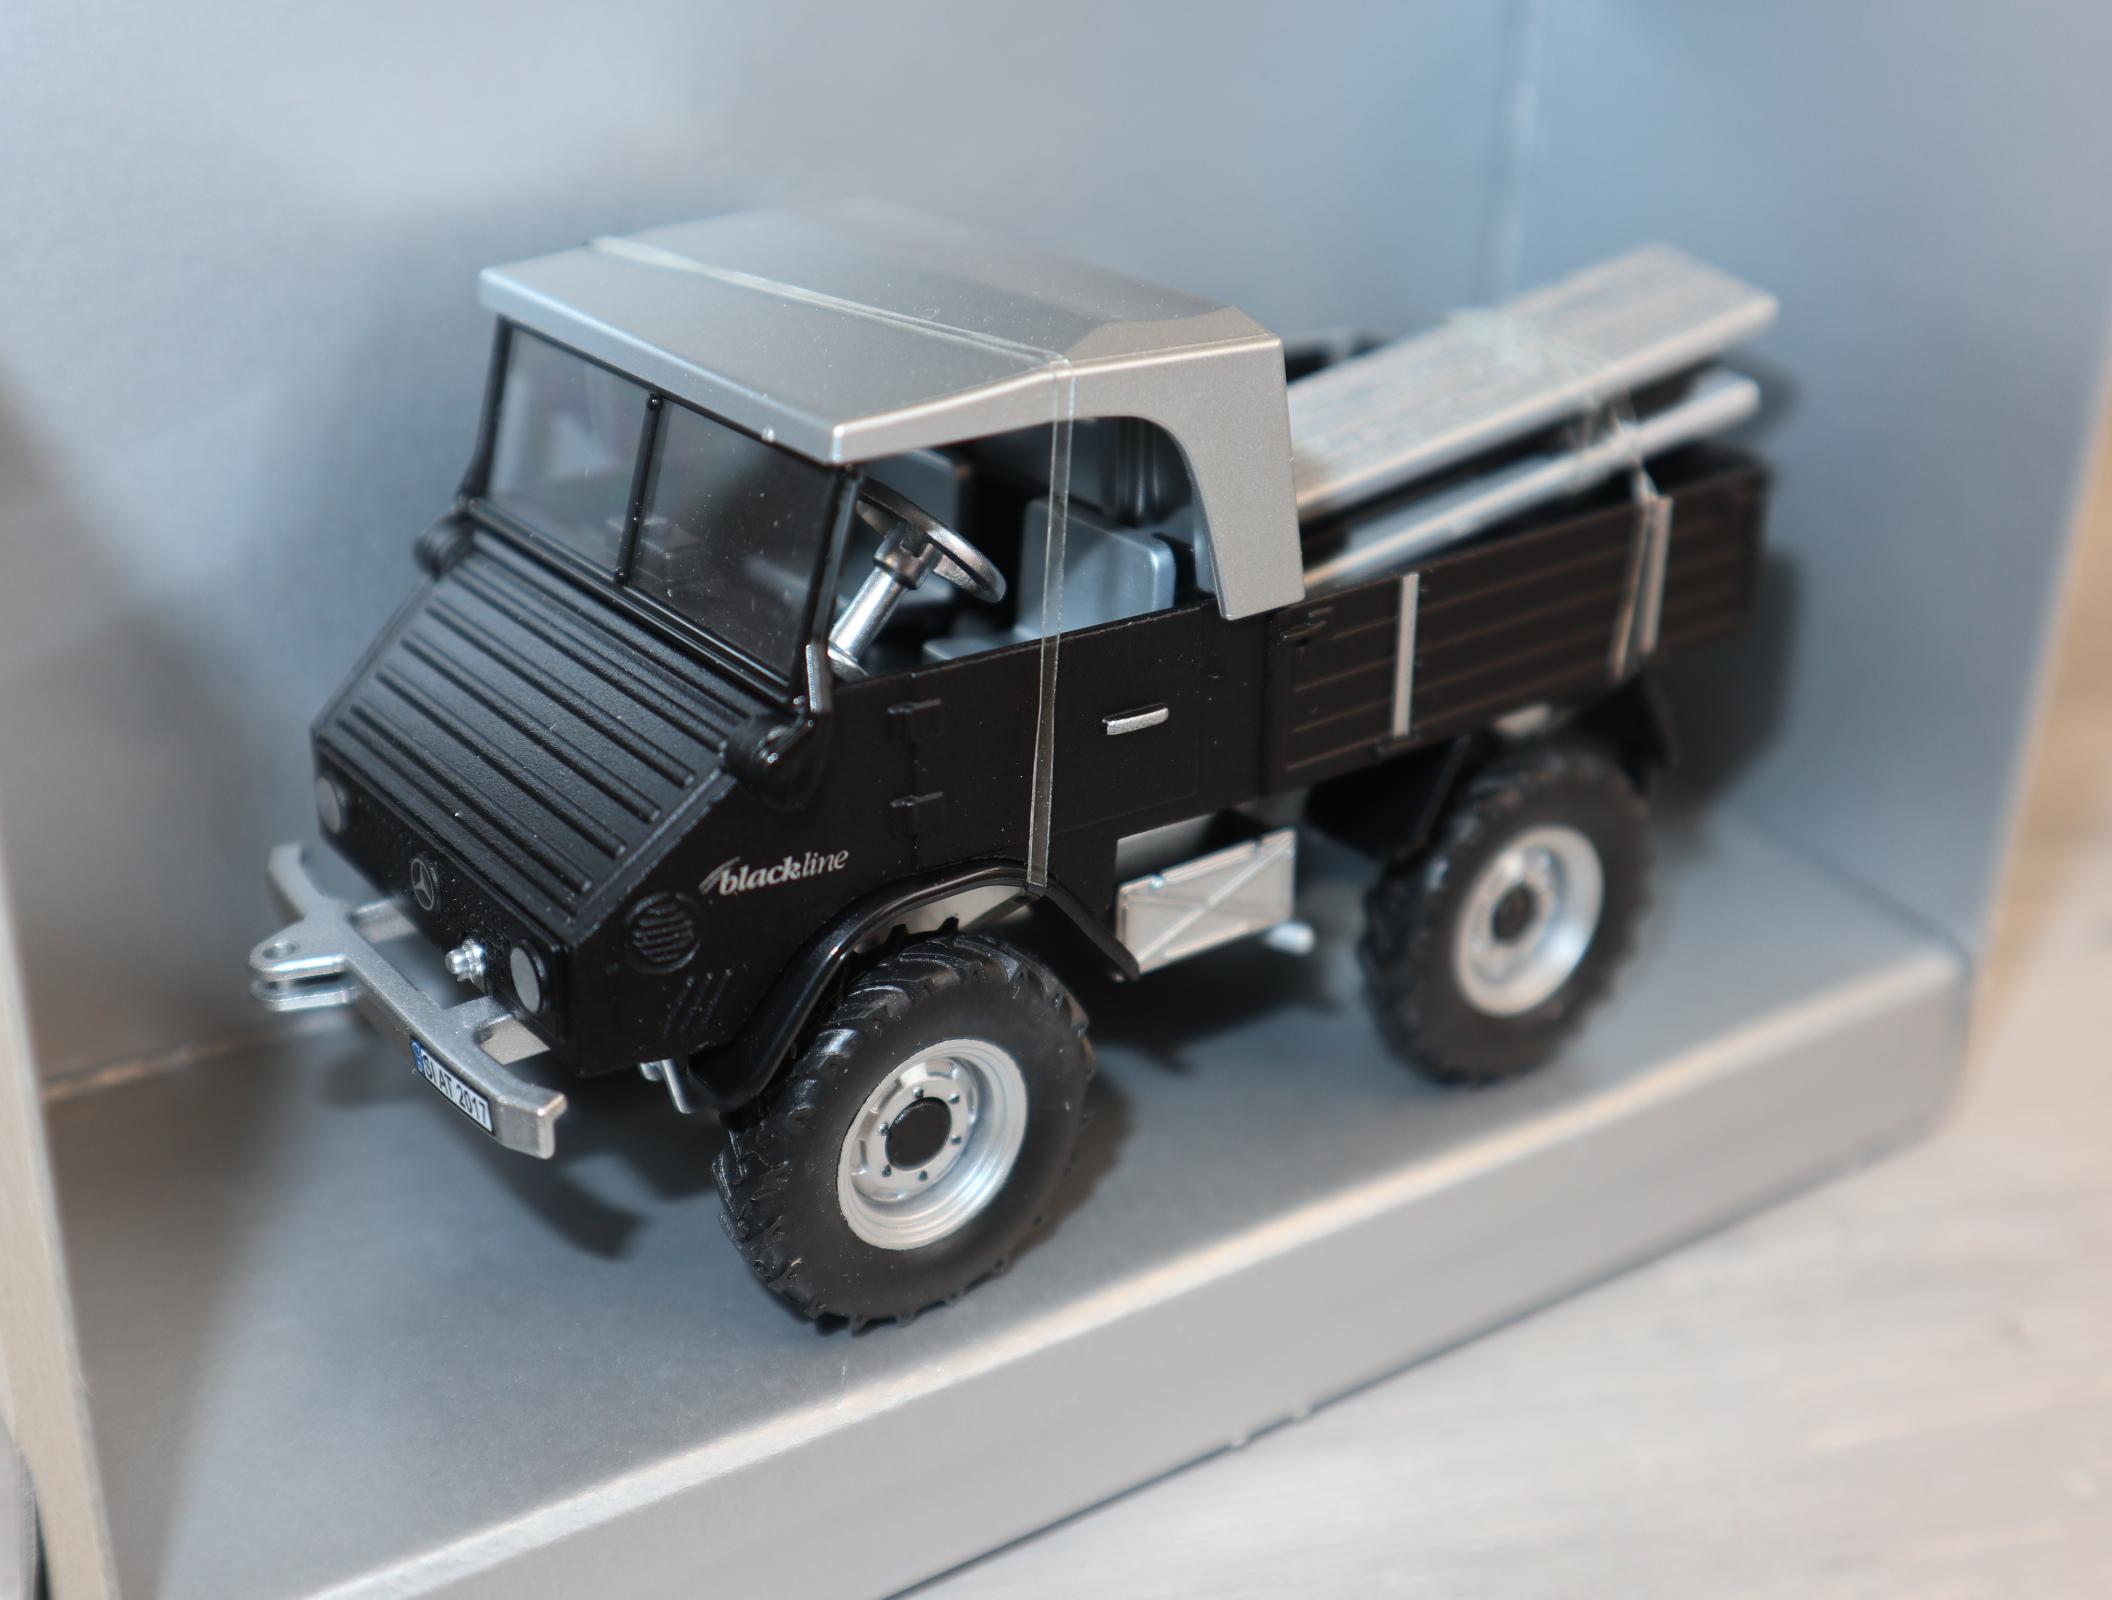 Siku 3450 in 1:32 Unimog 411 Sondermodell Blackline in OVP